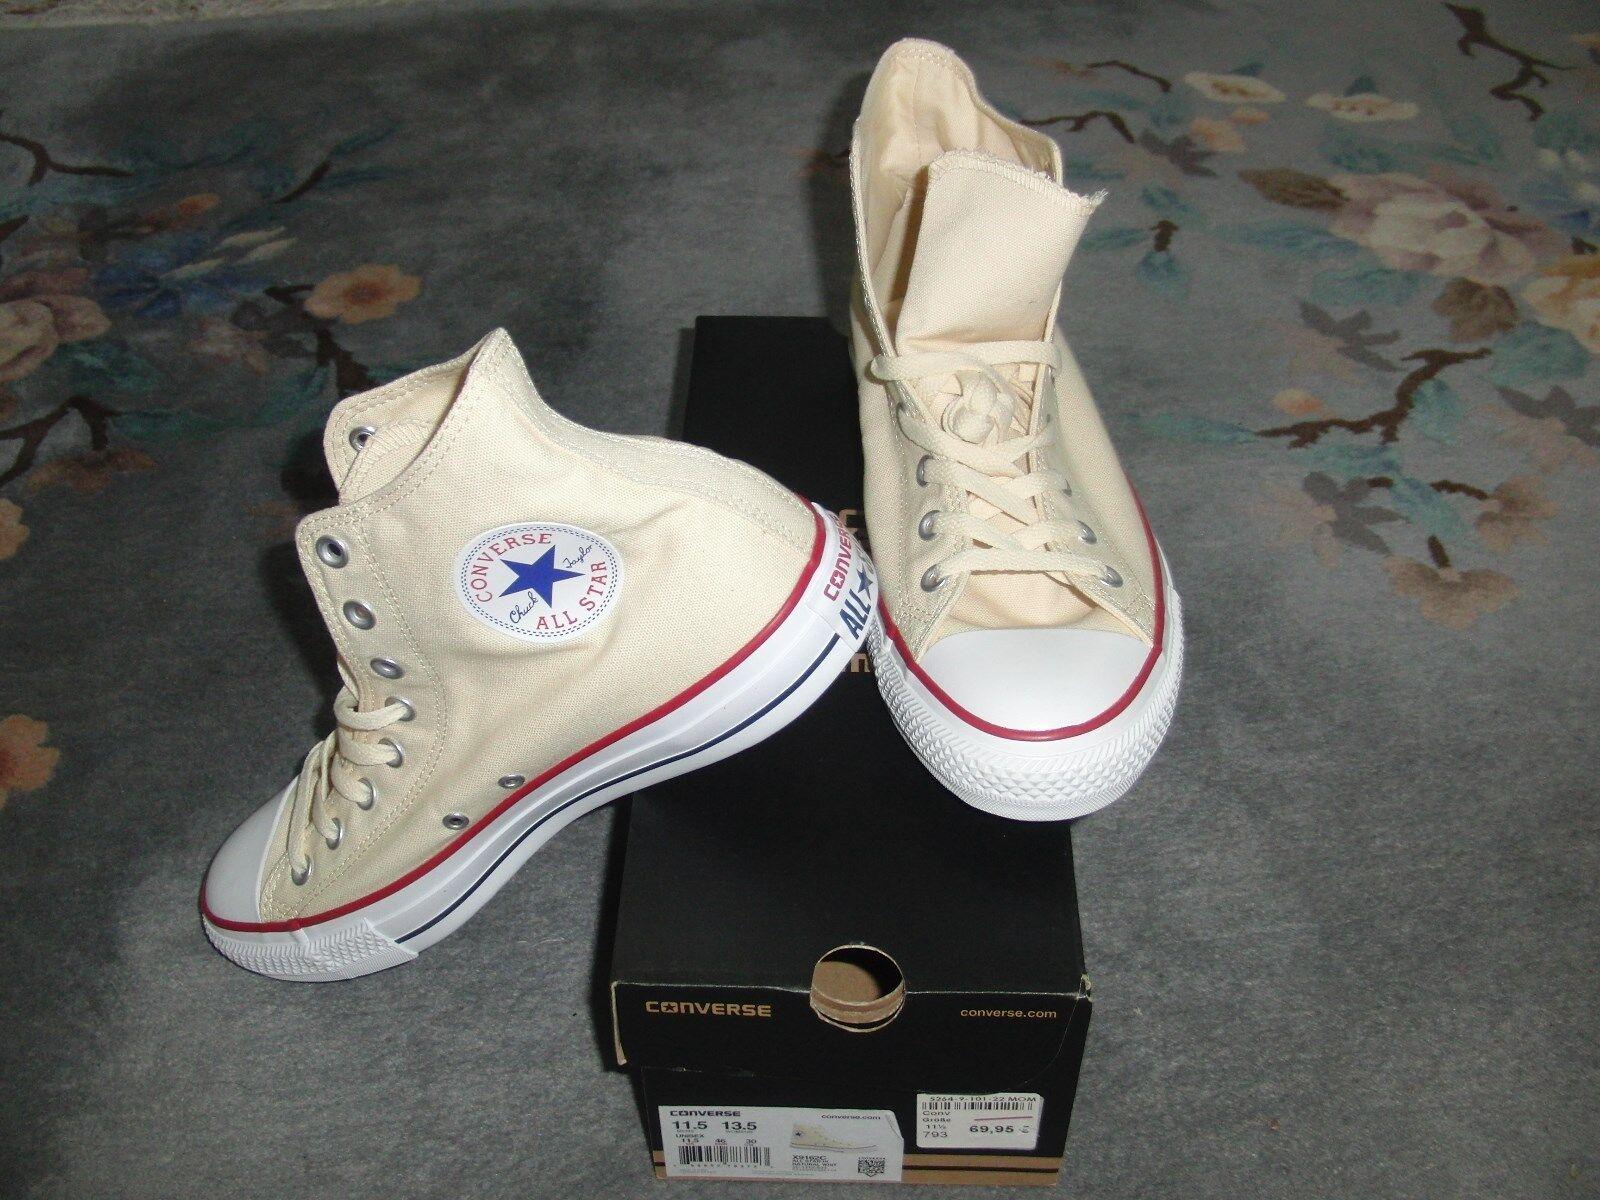 Converse Chucks Taylor Herren All Star Sneaker Schuhe Turnschuhe Herren Taylor Damen Freizeit 7ebadd